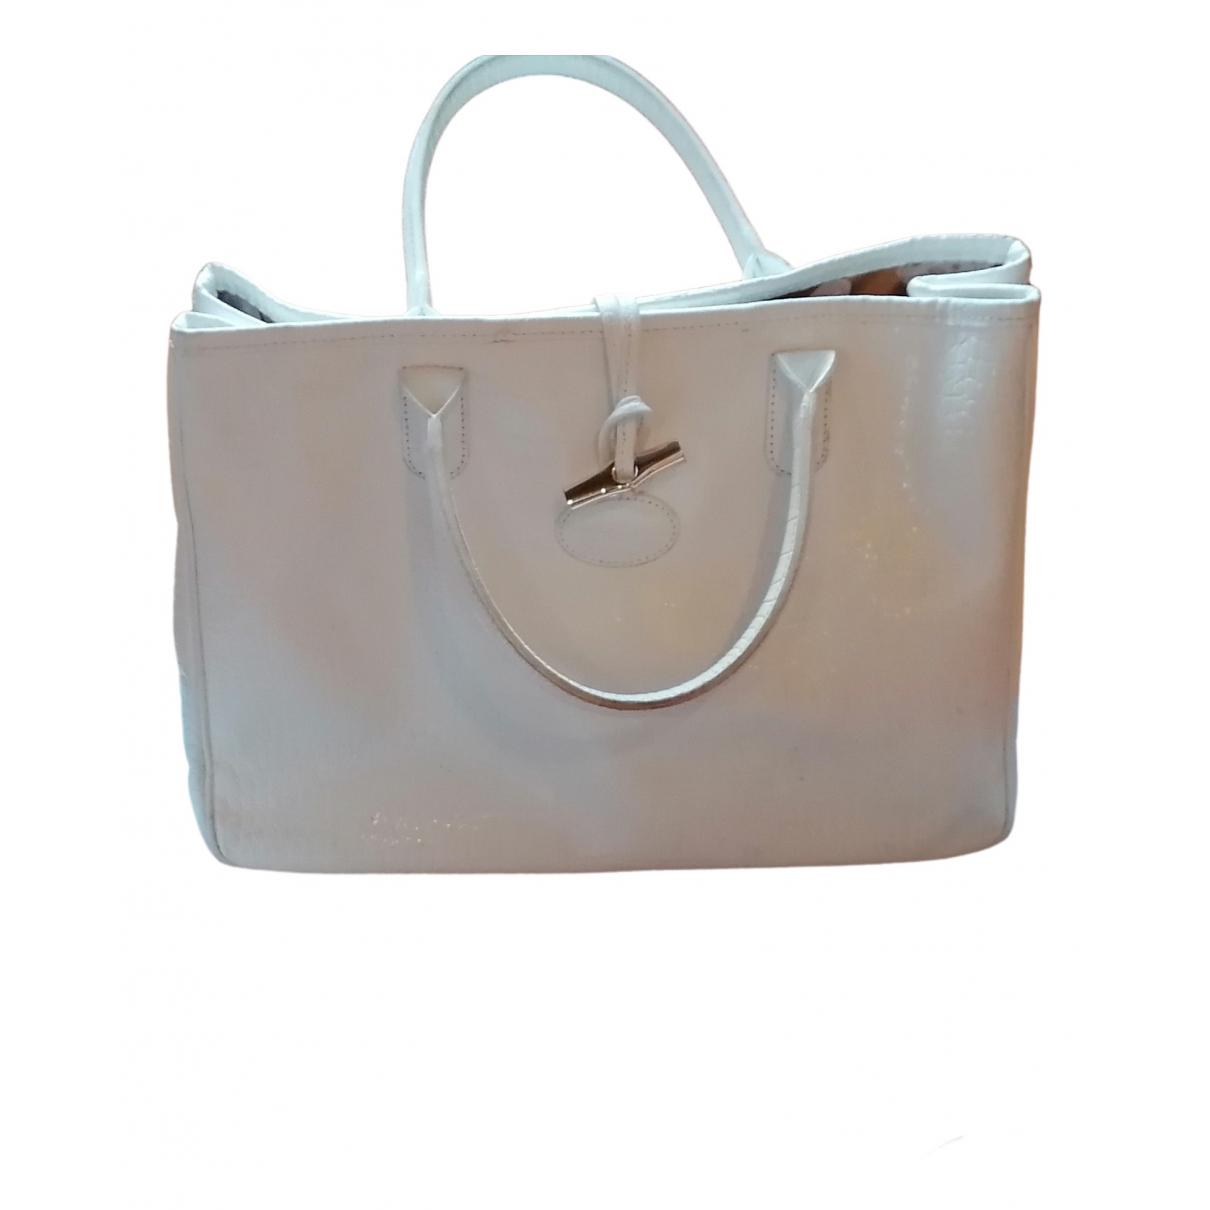 Longchamp - Sac a main Roseau pour femme en cuir - blanc